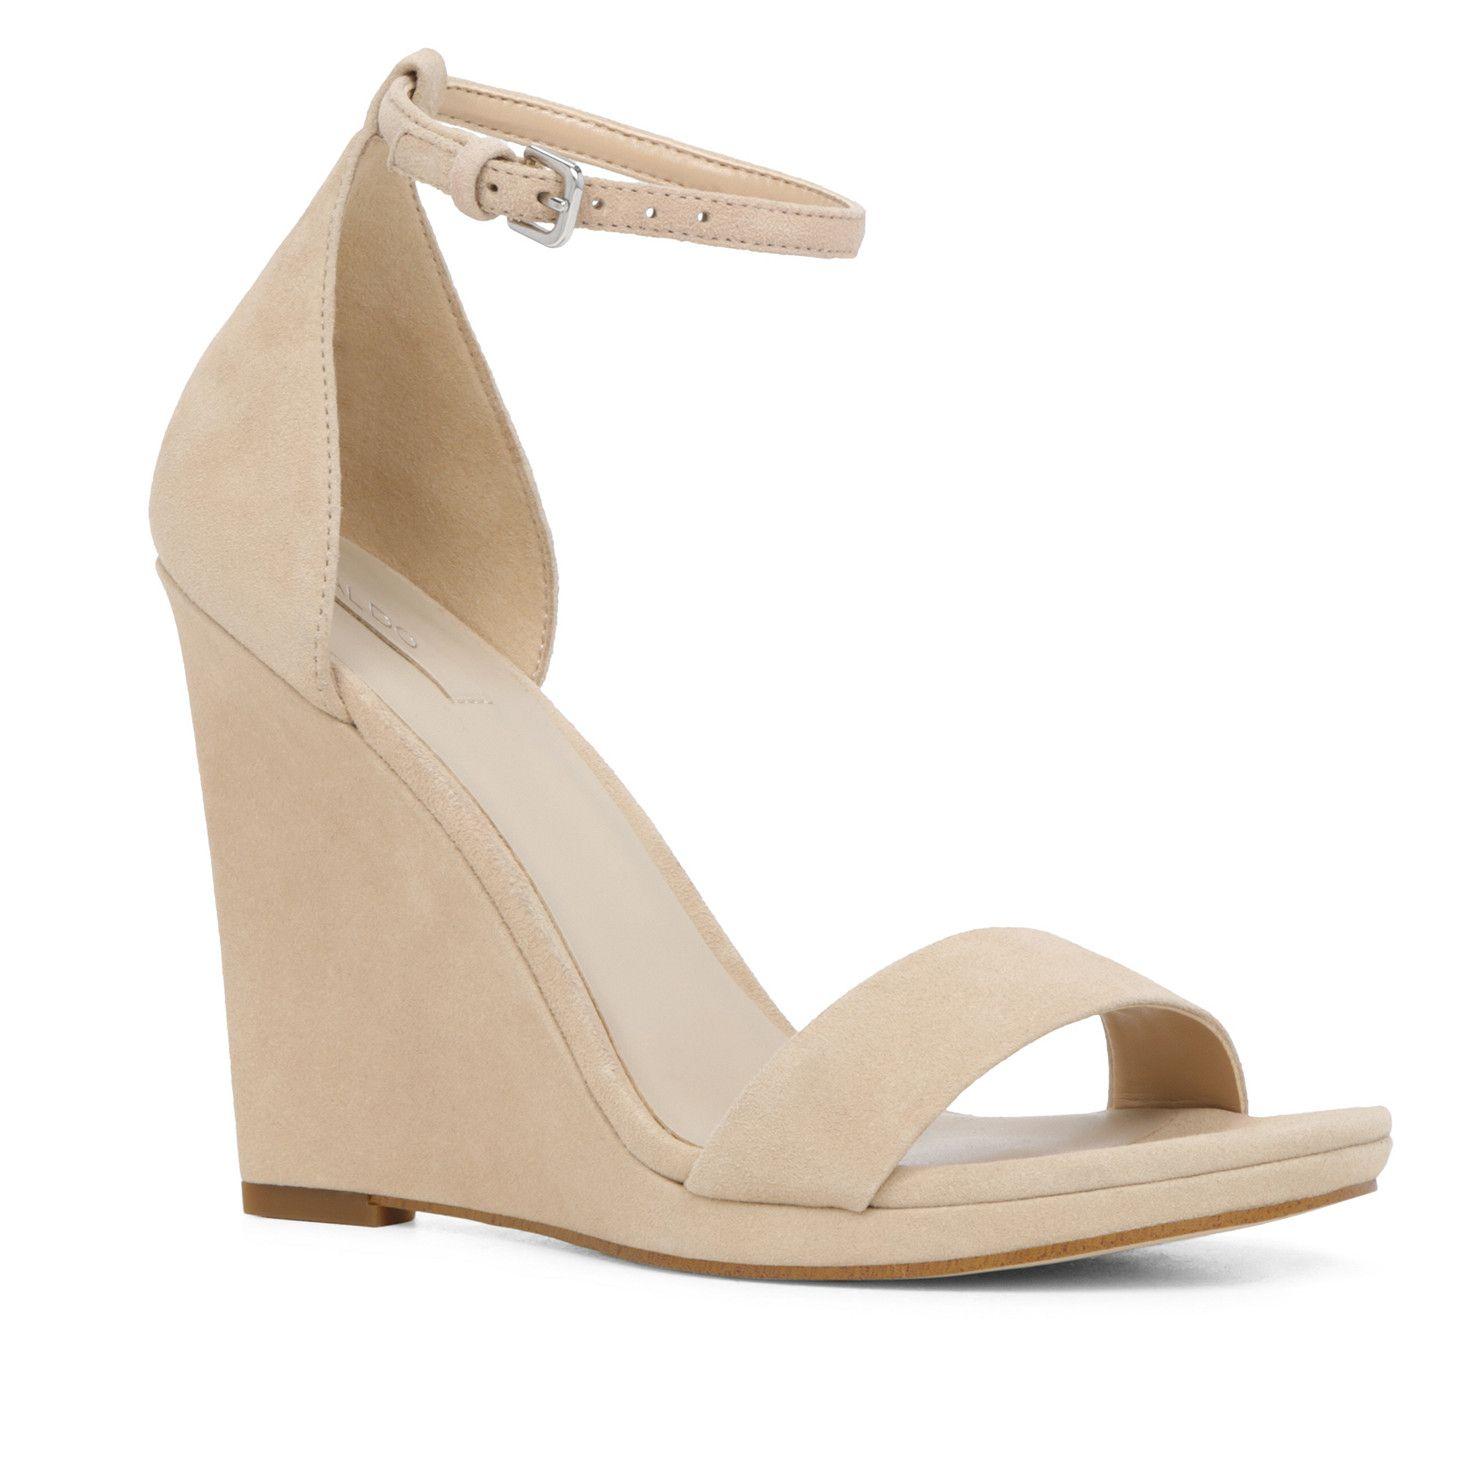 Womens sandals wedges - Elley Wedge Sandals Women S Sandals Aldoshoes Com